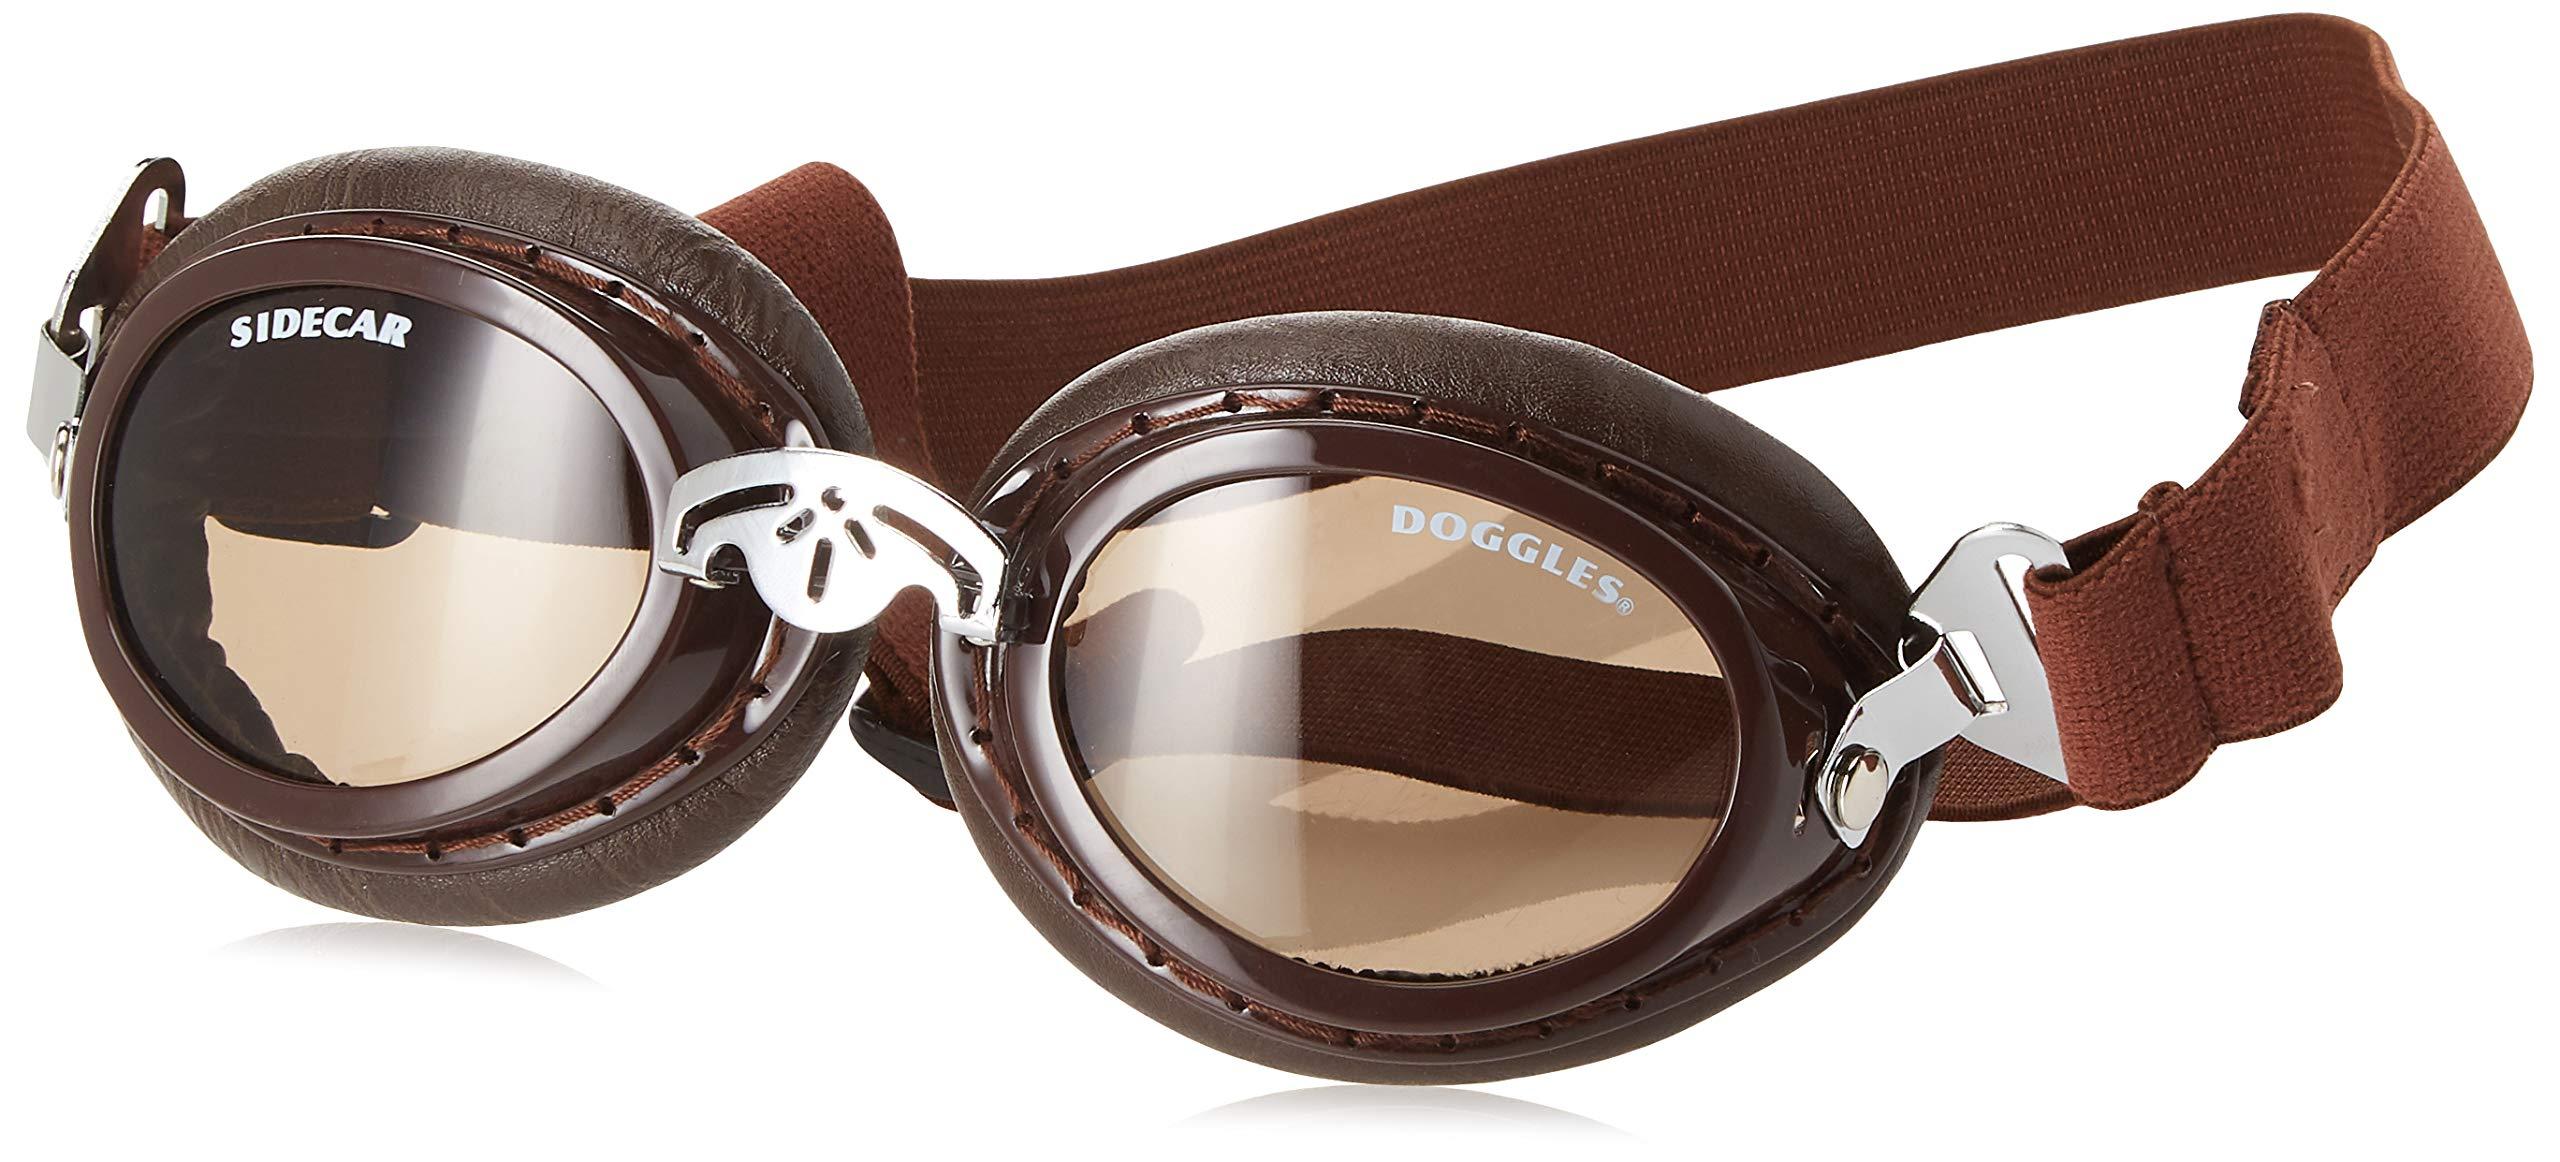 Sidecar Eyewear, one Size, Copper by Doggles